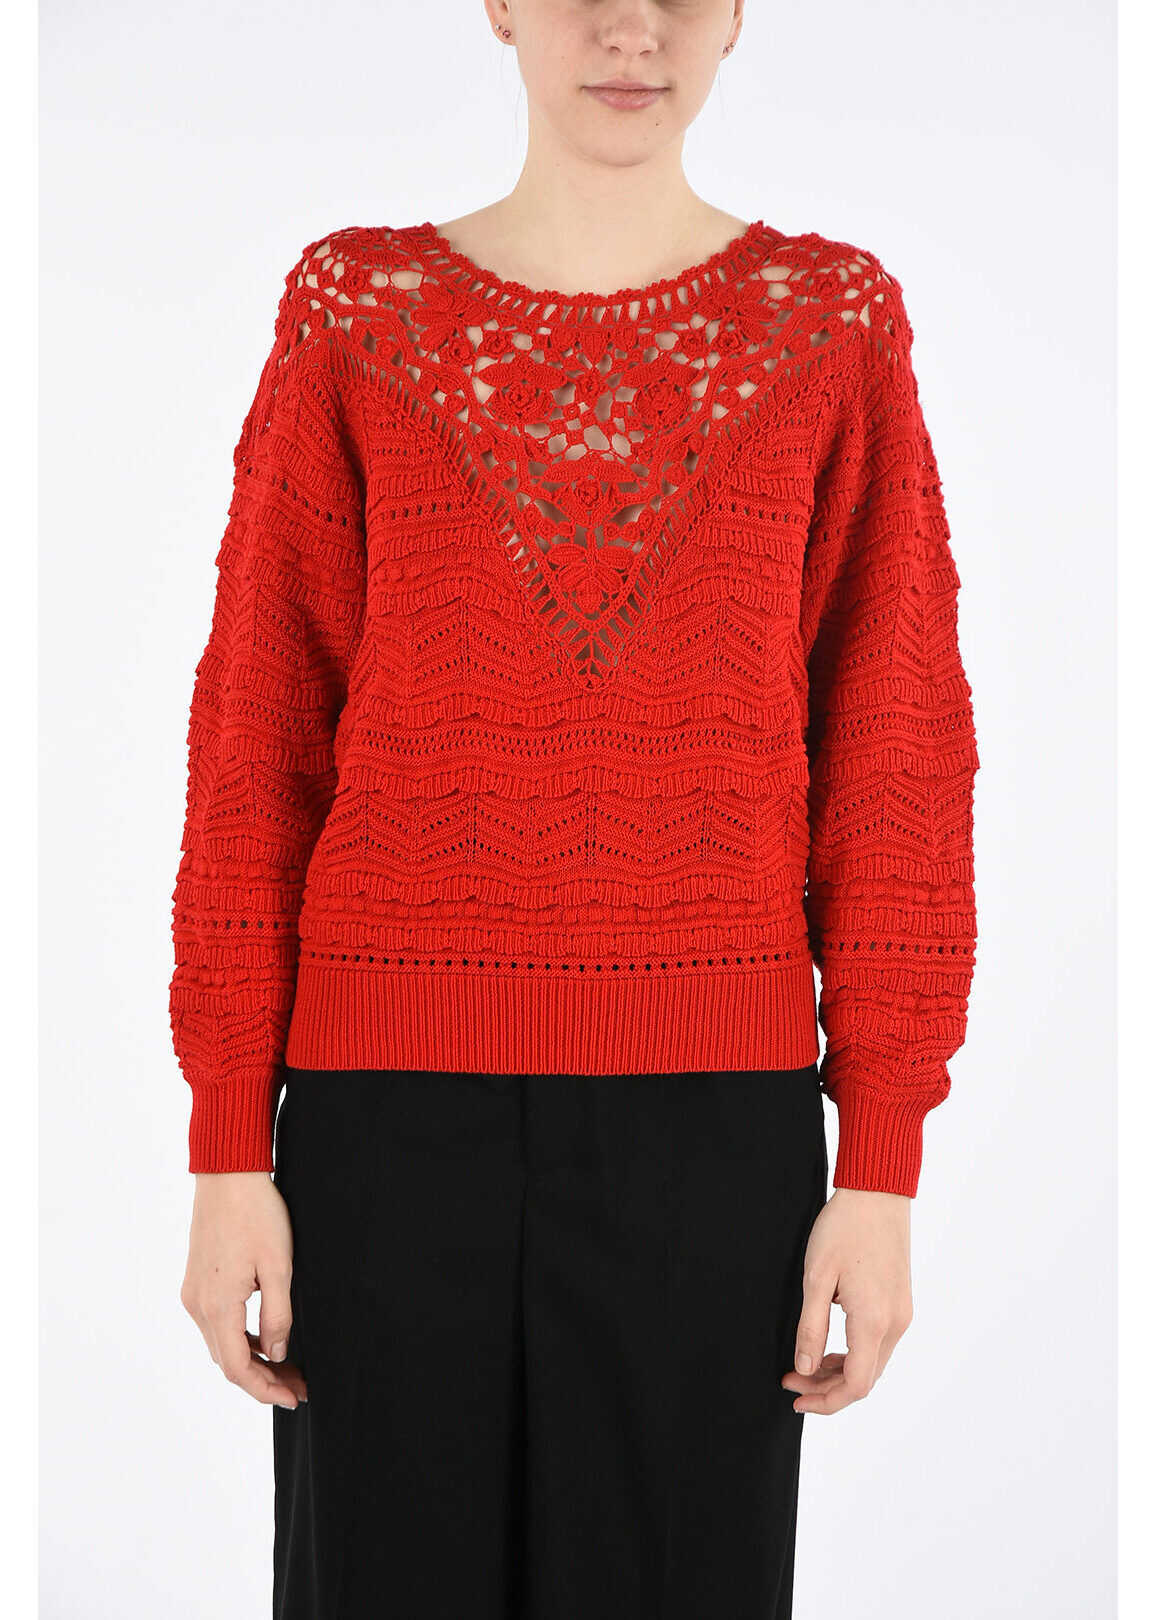 Isabel Marant bateau neckline crochet sweater RED